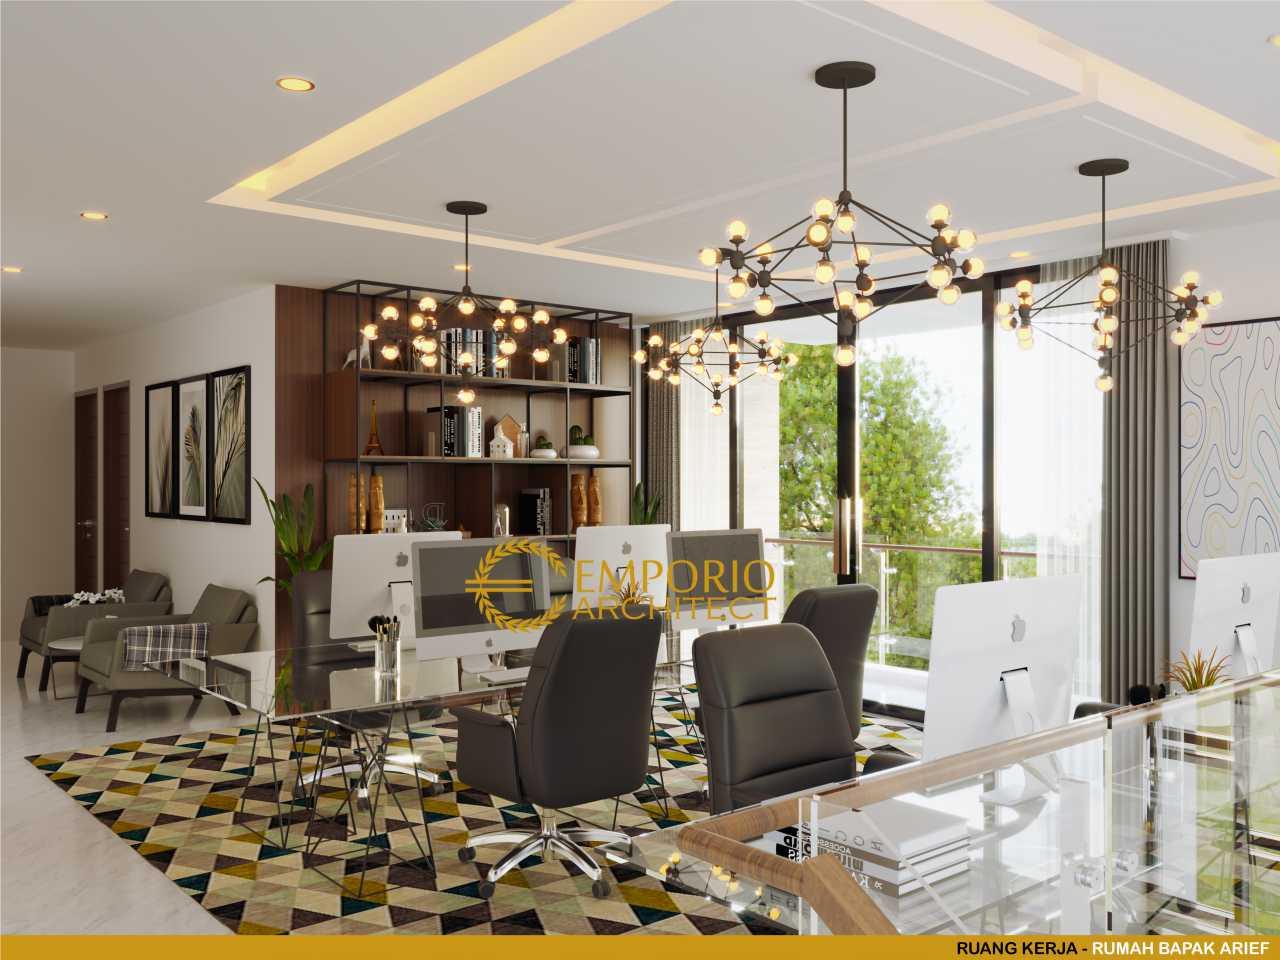 12 ide desain interior ruang kerja nyaman modern minimalis berestetika part 2 170320041252462585